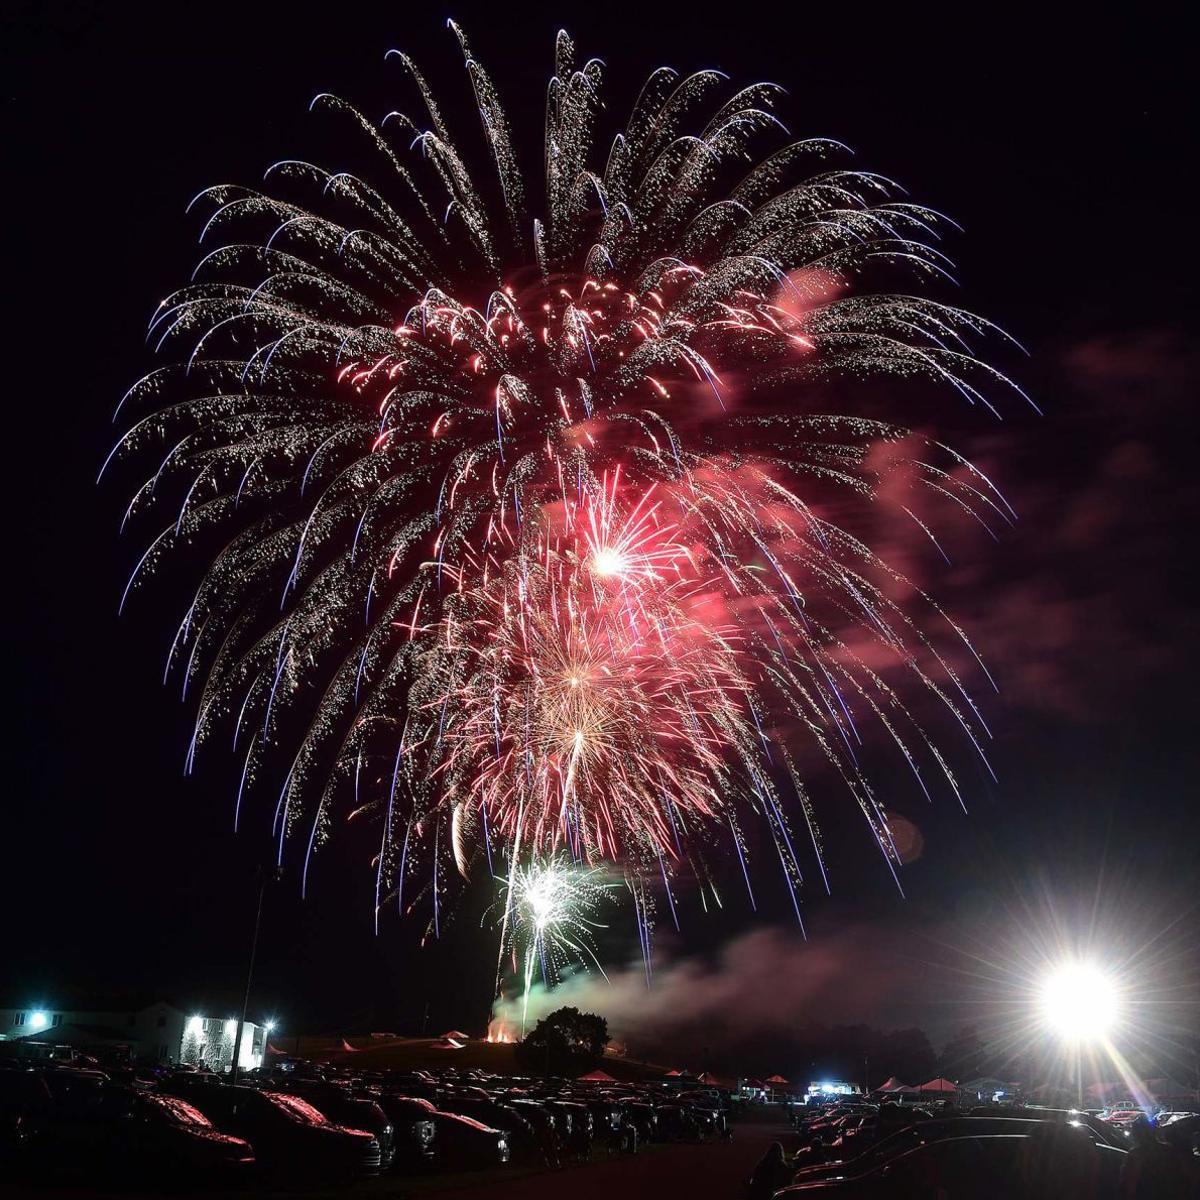 Cumberlink Restaurants Open On Christmas Day Carlisle Pa 2021 Carlisle To Host Virtual July 4 Celebration Drops Fireworks Display Carlisle Cumberlink Com